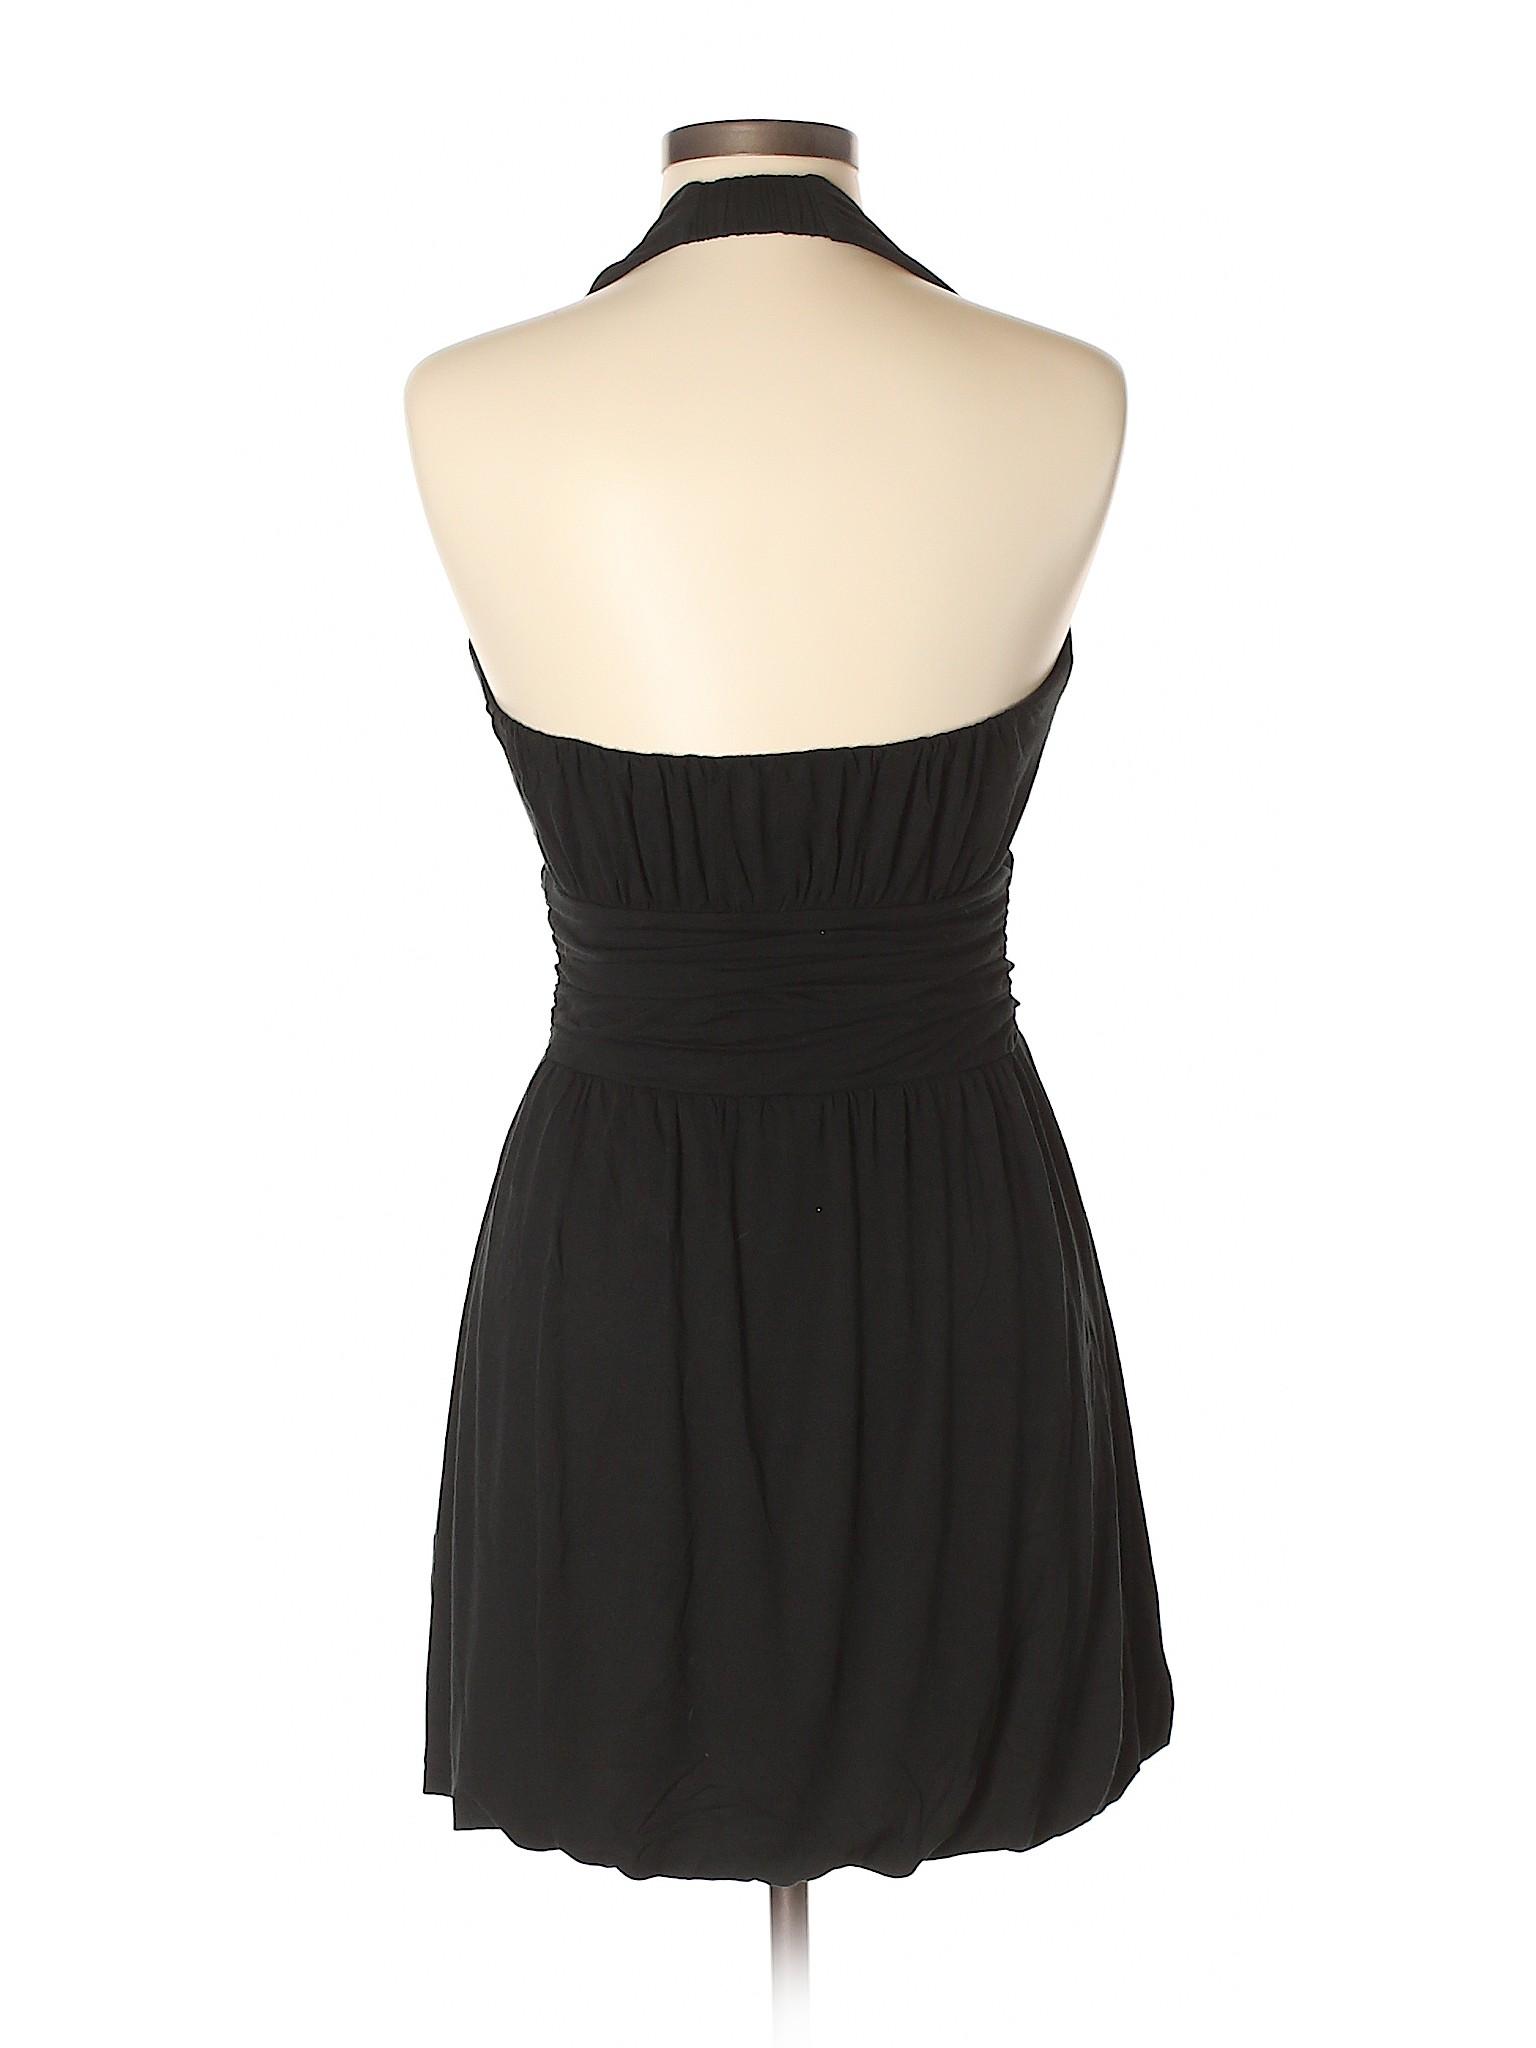 Market Casual winter House White Boutique Black Dress ZWIq0ZB